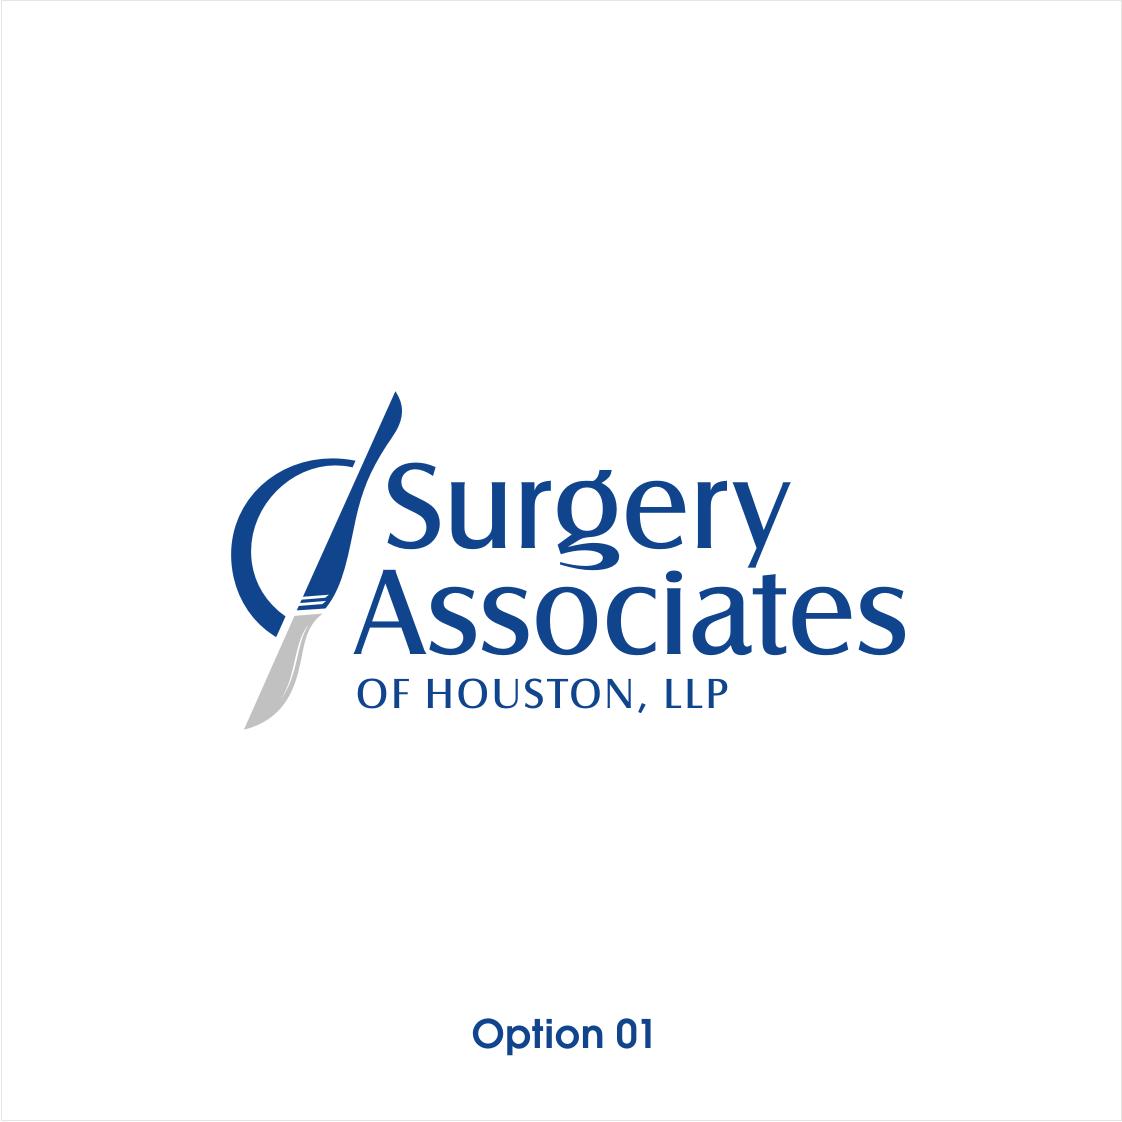 SAH - Surgery Associates of Houston, LLP